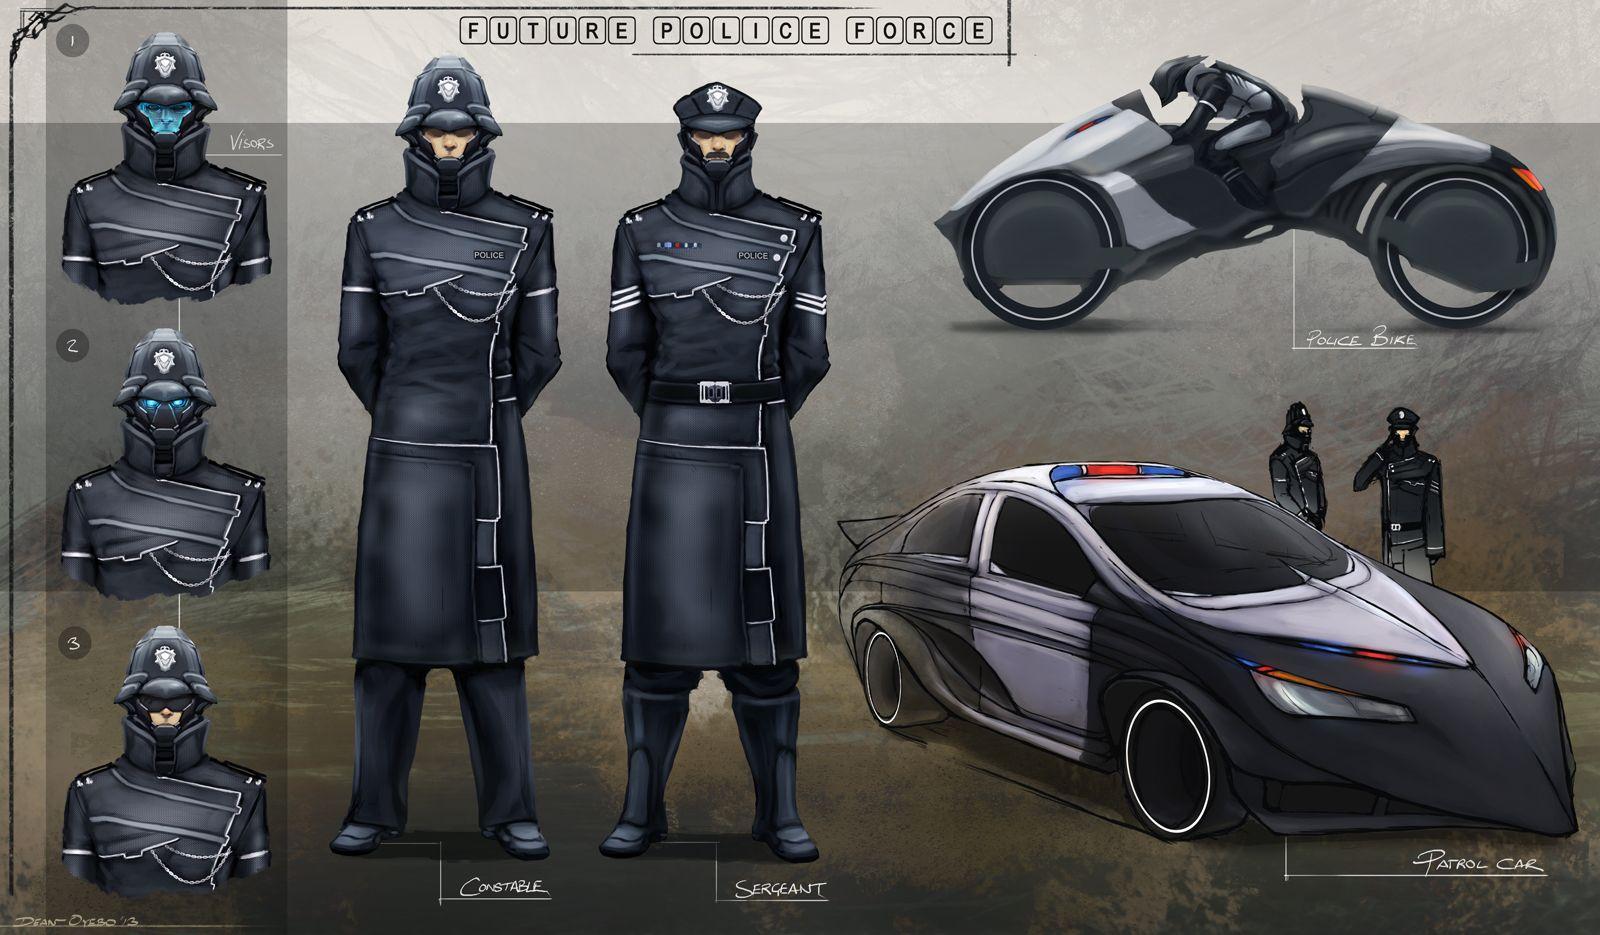 Image Gallery Futuristic Police